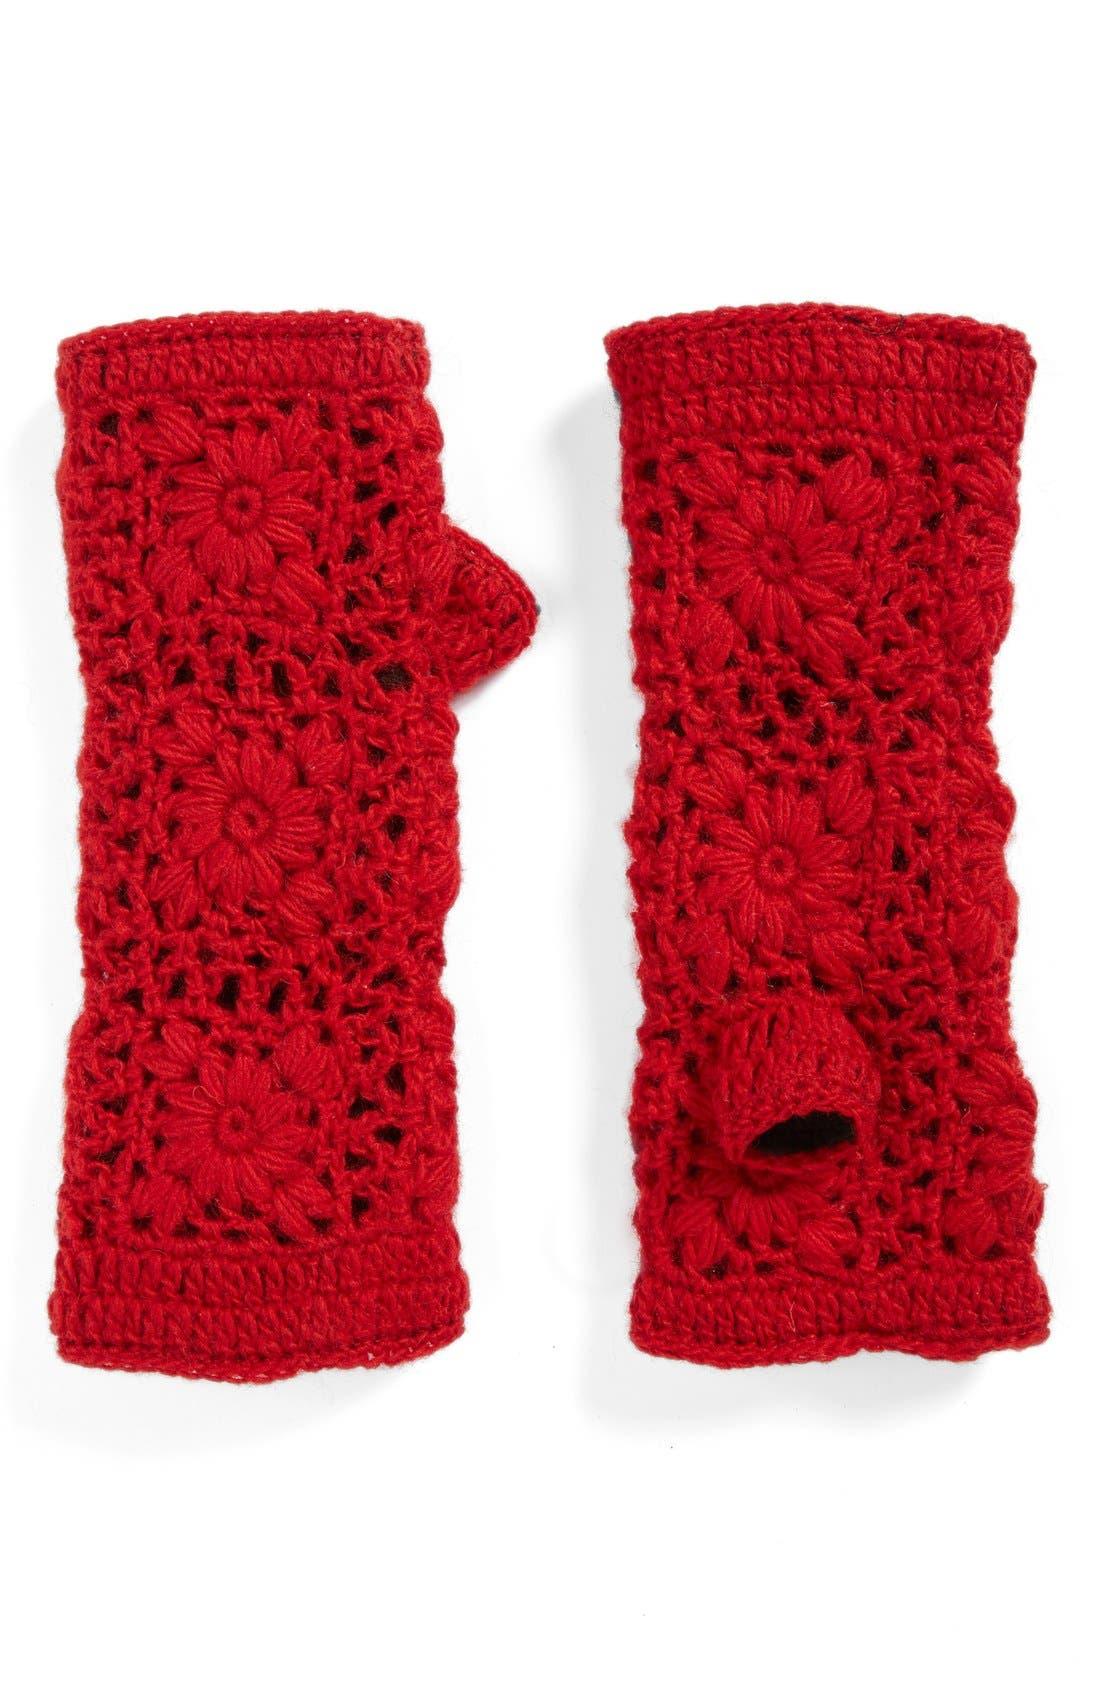 Alternate Image 1 Selected - Nirvanna Designs Crochet Handwarmers